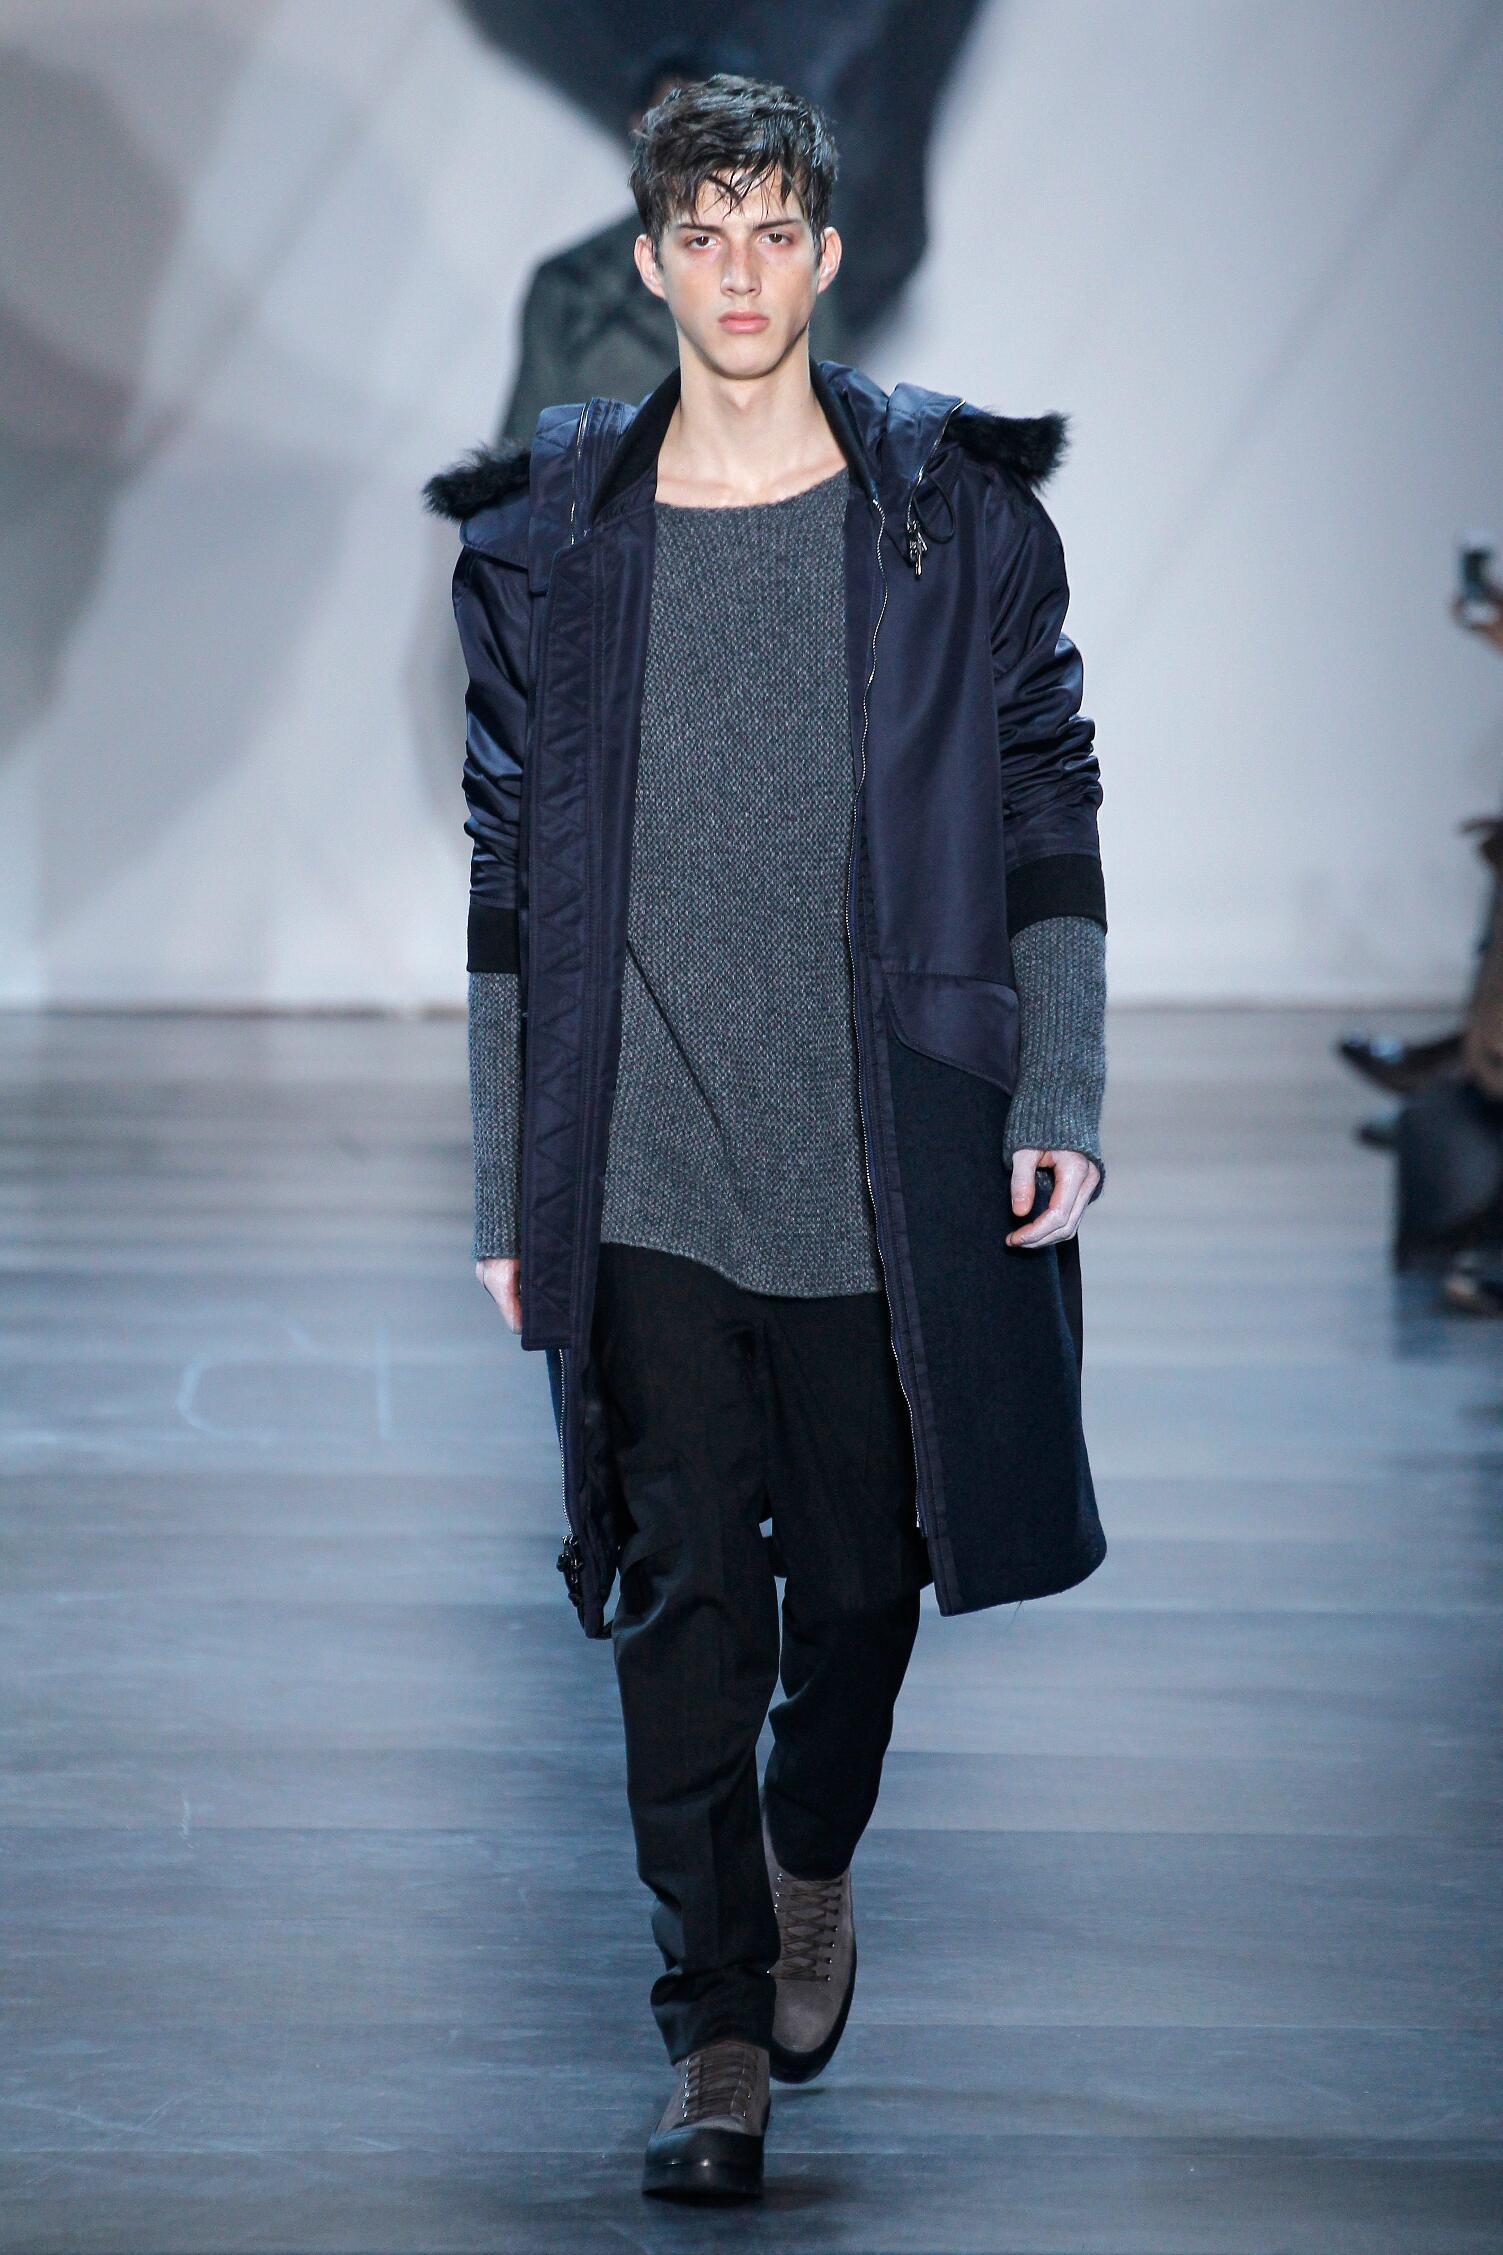 3.1 Phillip Lim Fall Winter 2015 16 Mens Collection Paris Fashion Week